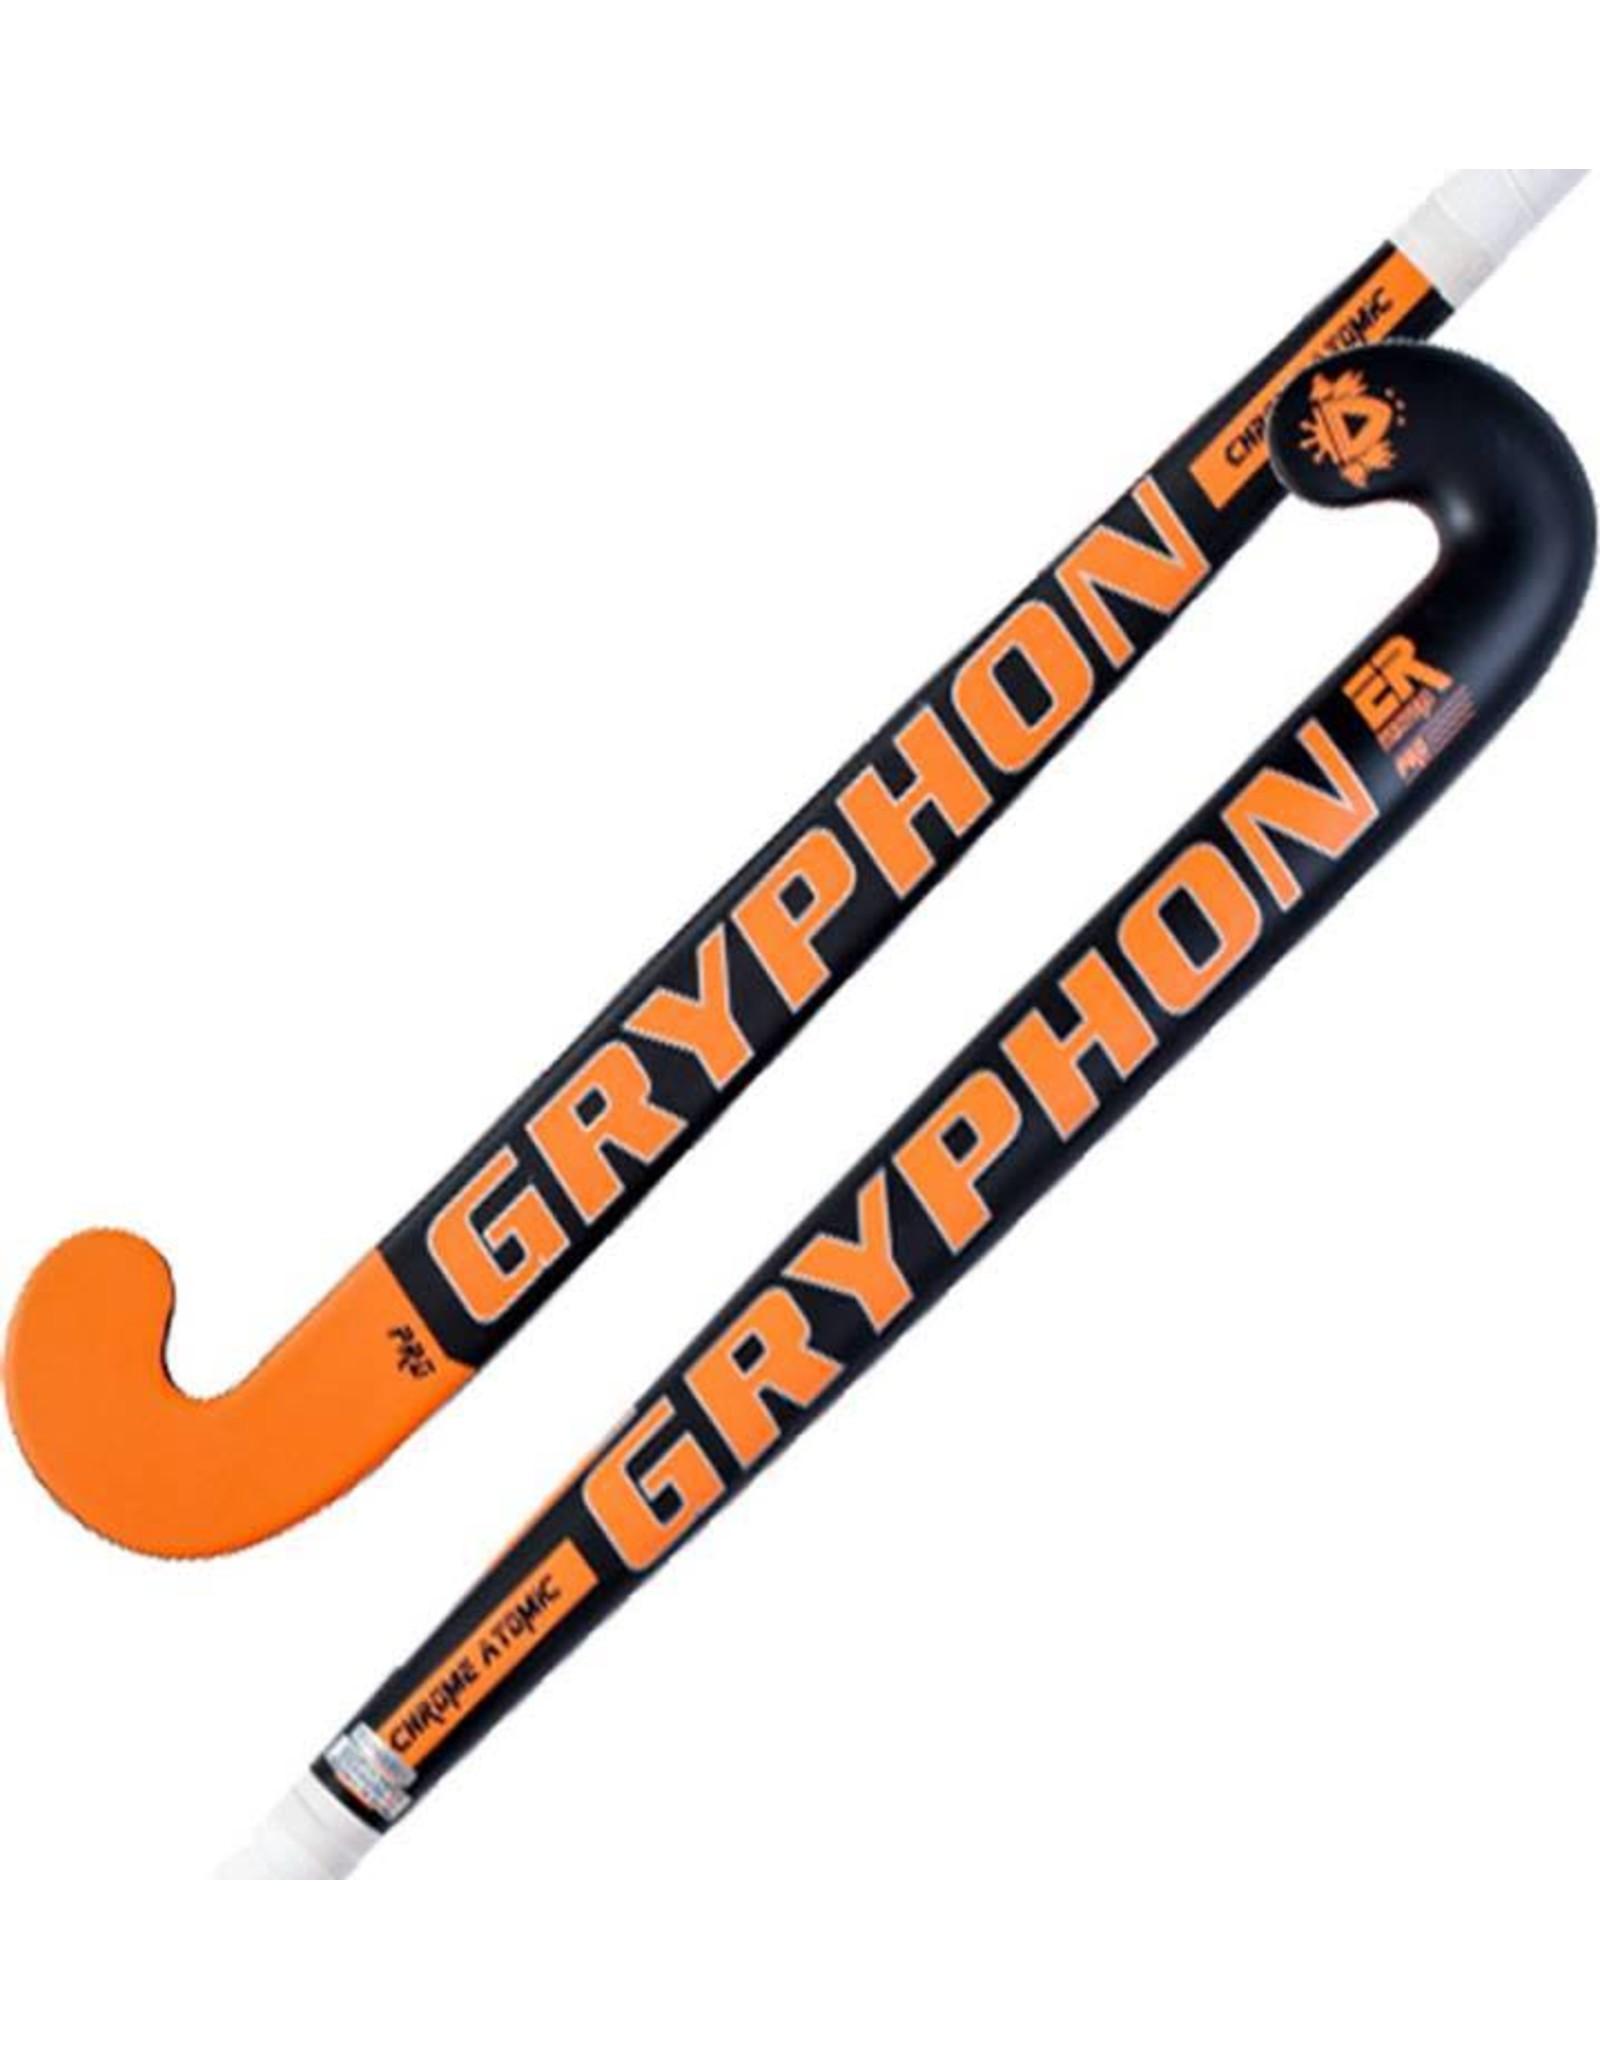 GRYPHON GRYPHON JR CHROME ATOMIC JPC  17-18